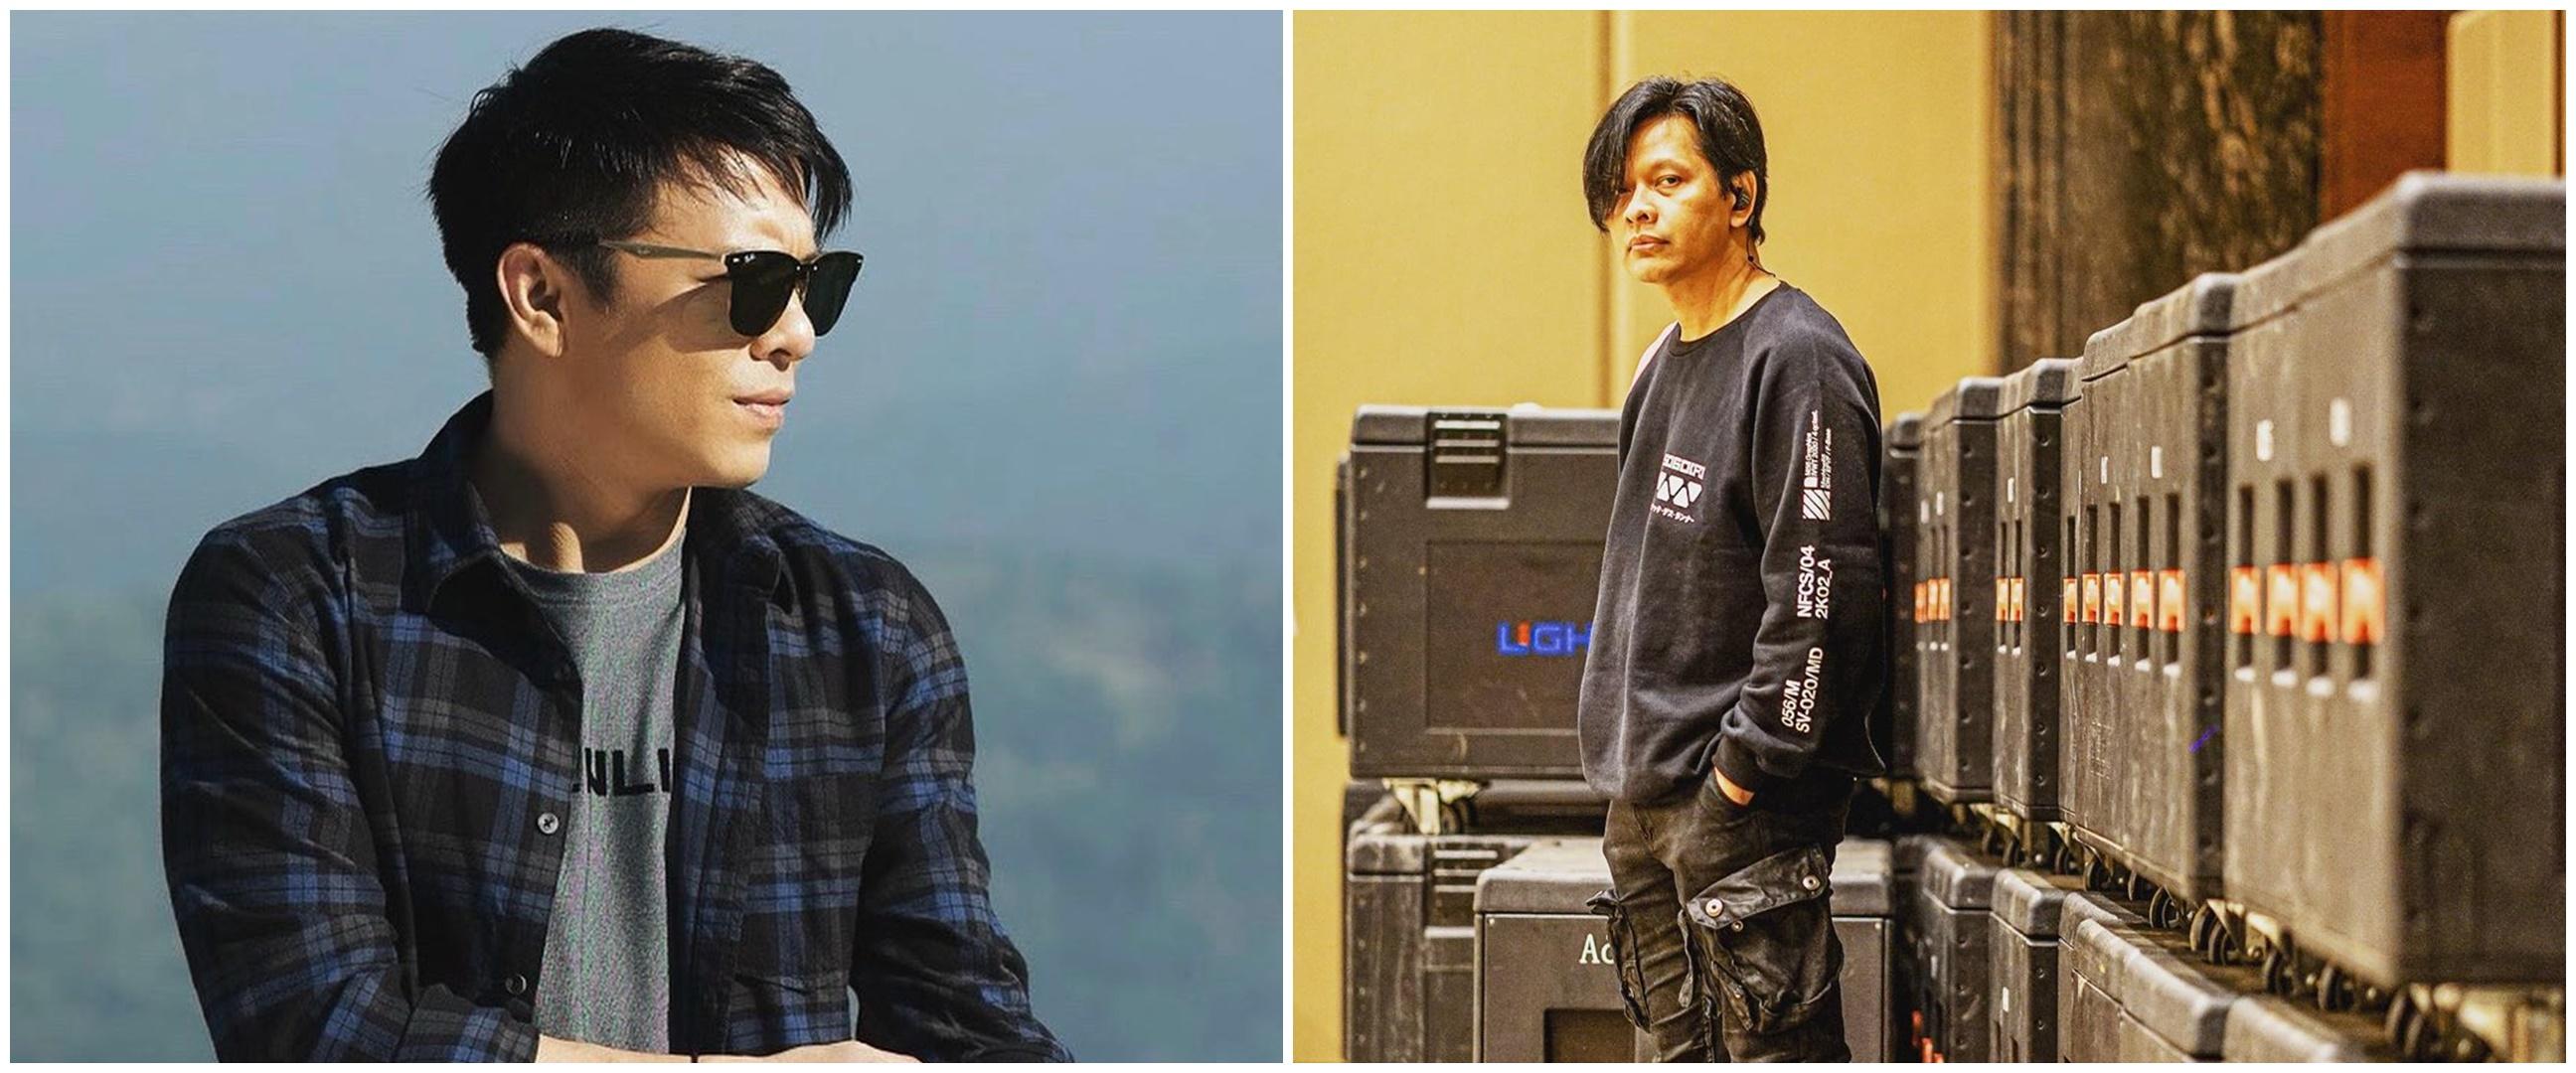 Potret lawas 6 vokalis band Tanah Air saat sekolah, manglingi